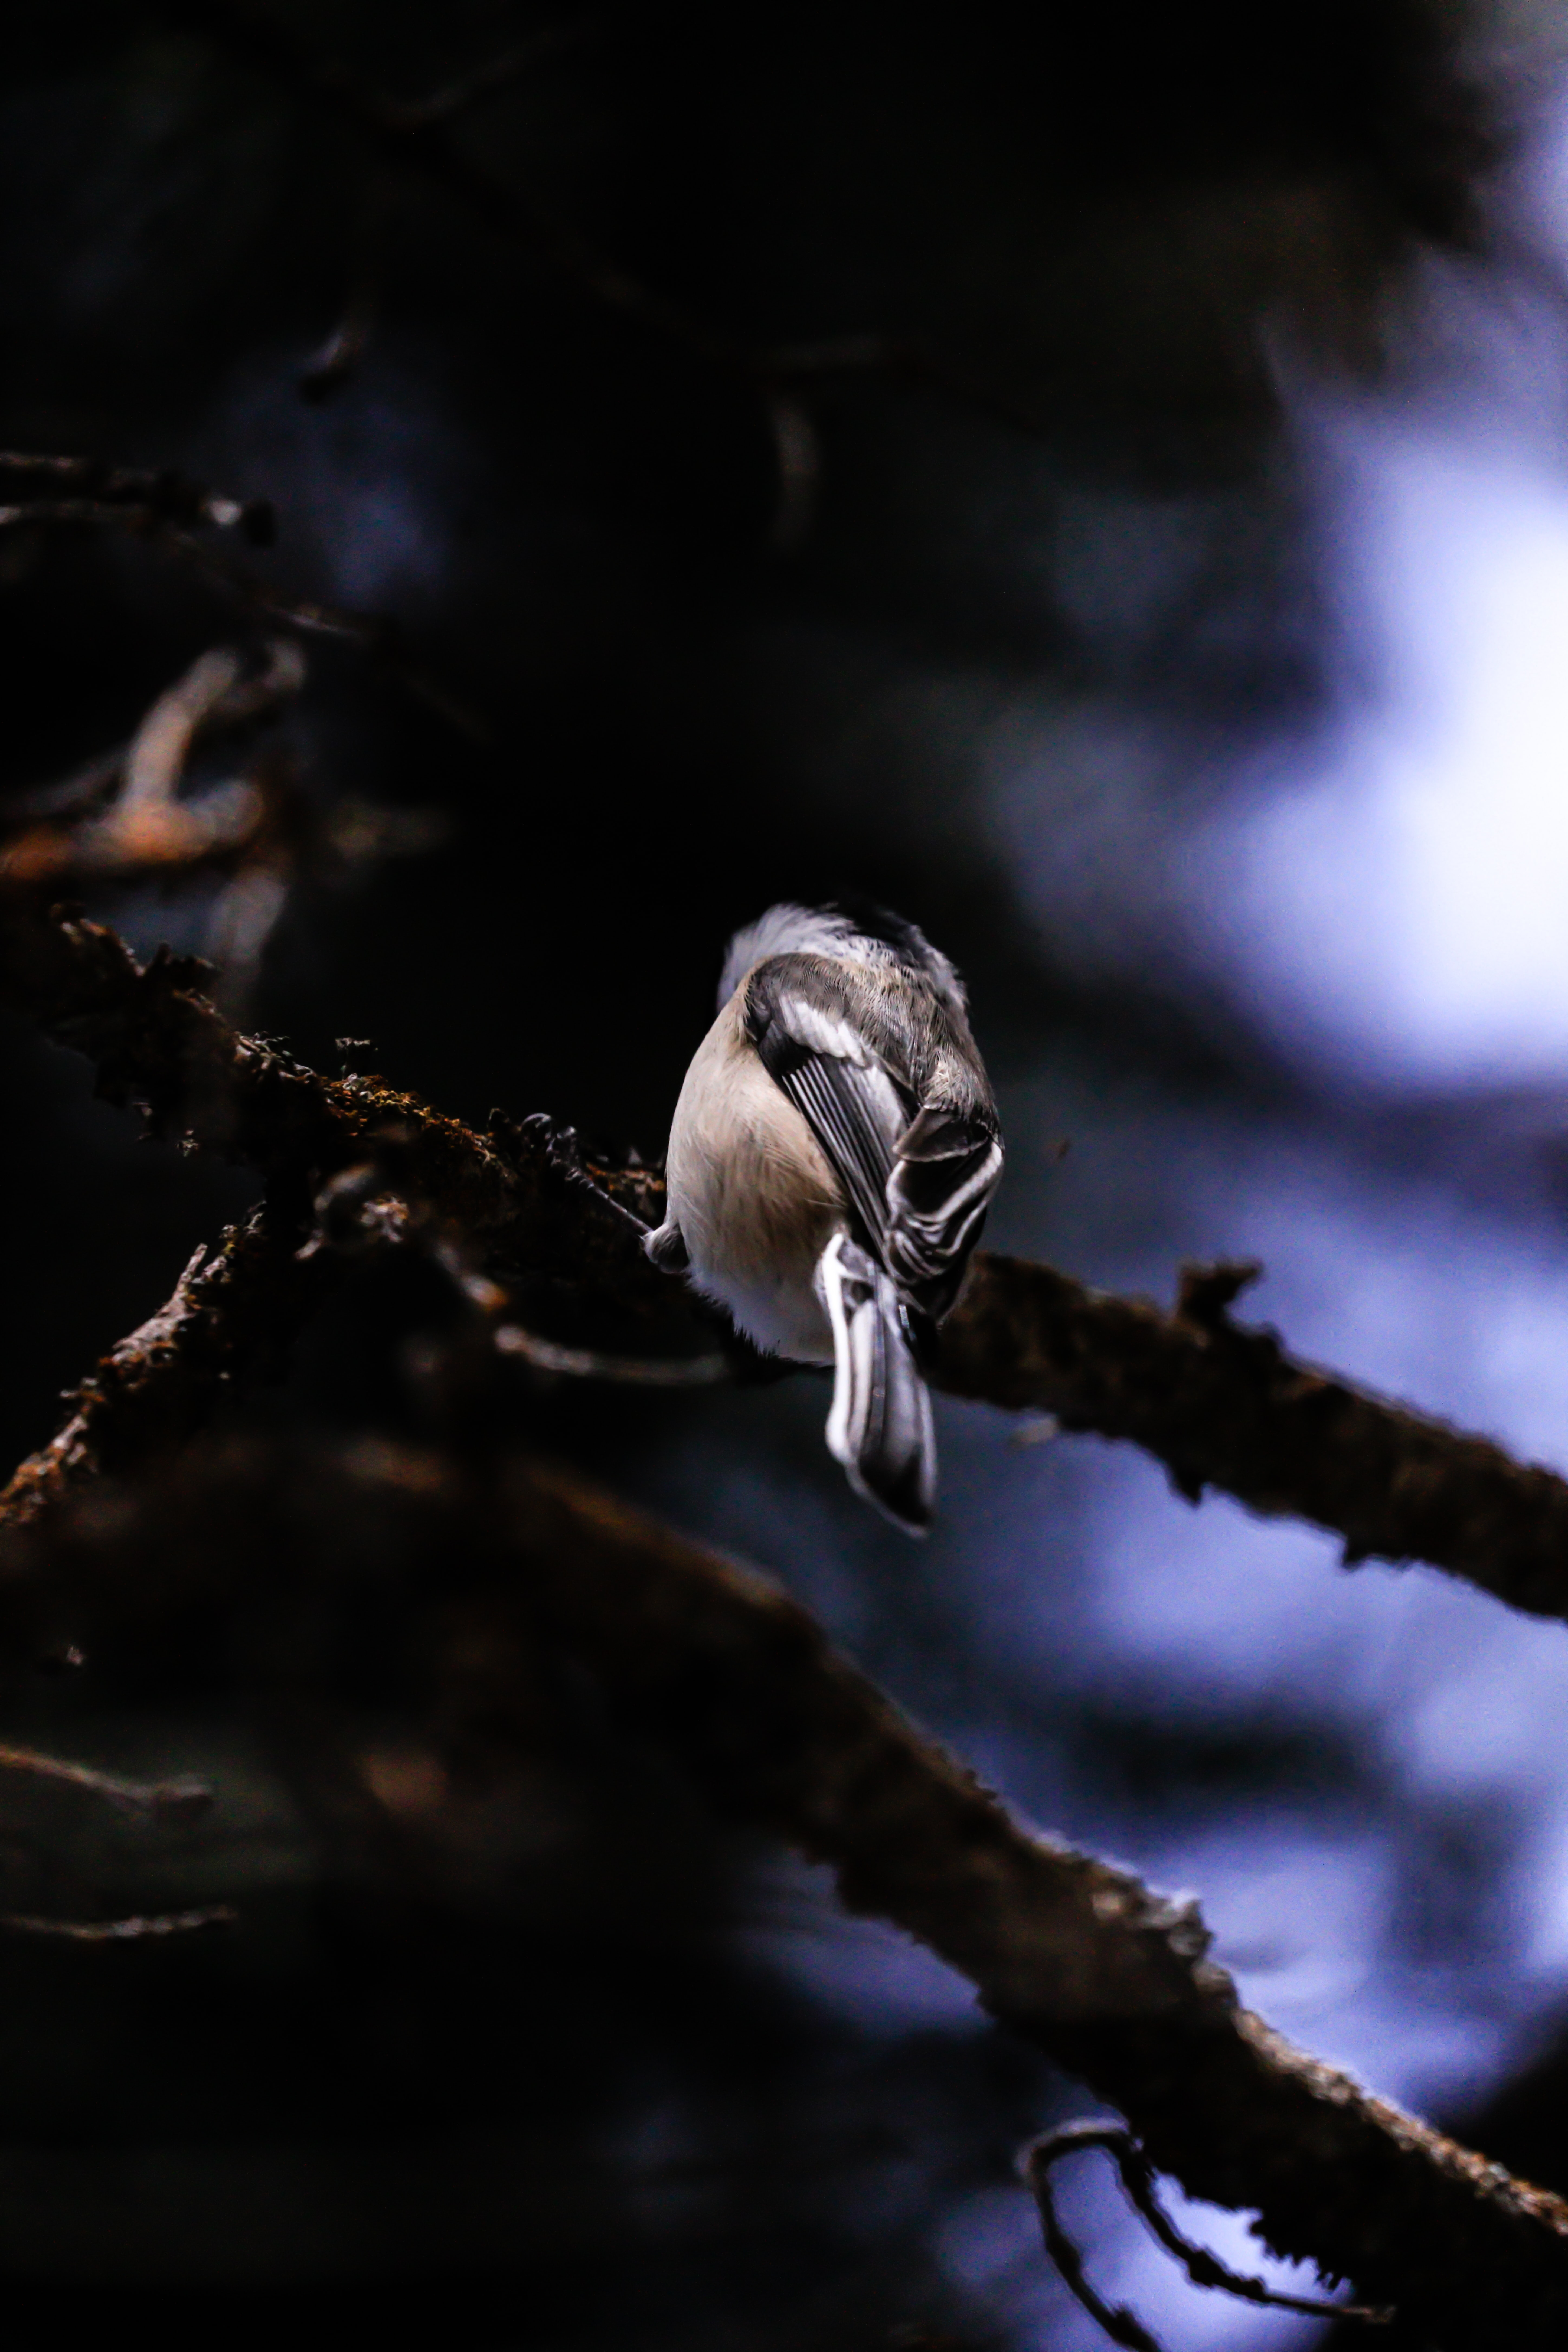 macro photography of gray bird on branch